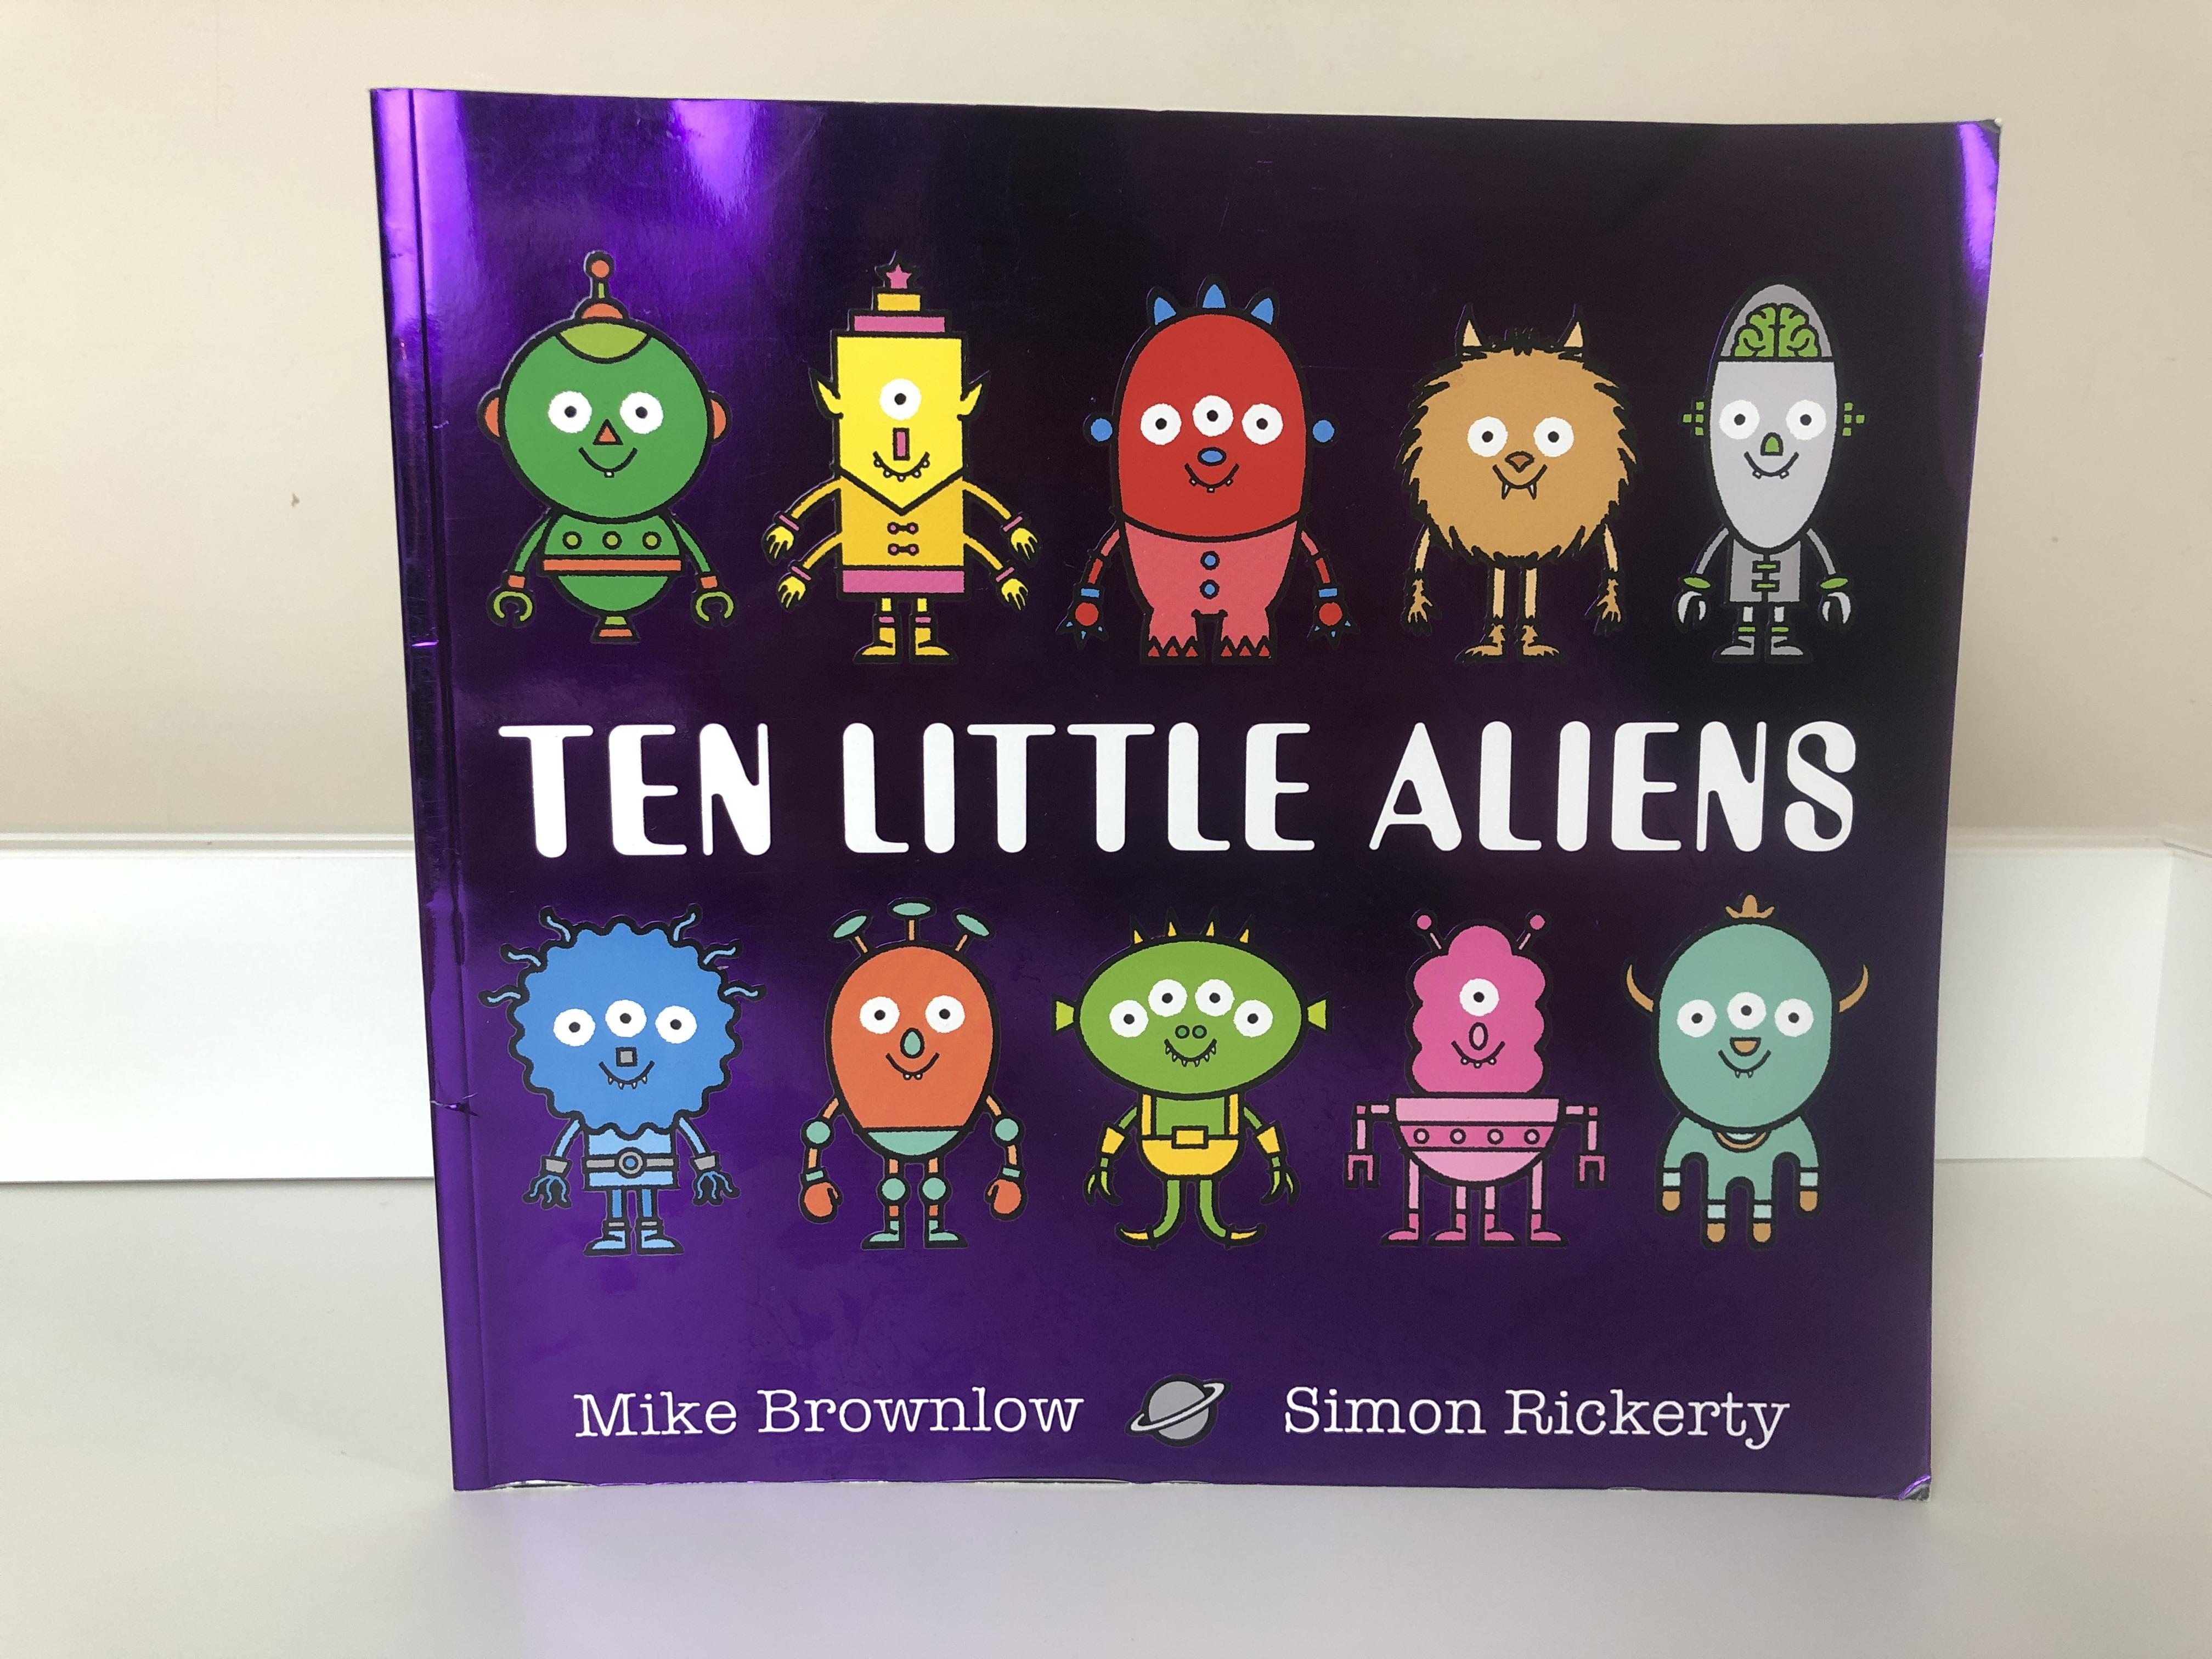 Ten Little Aliens Book Review